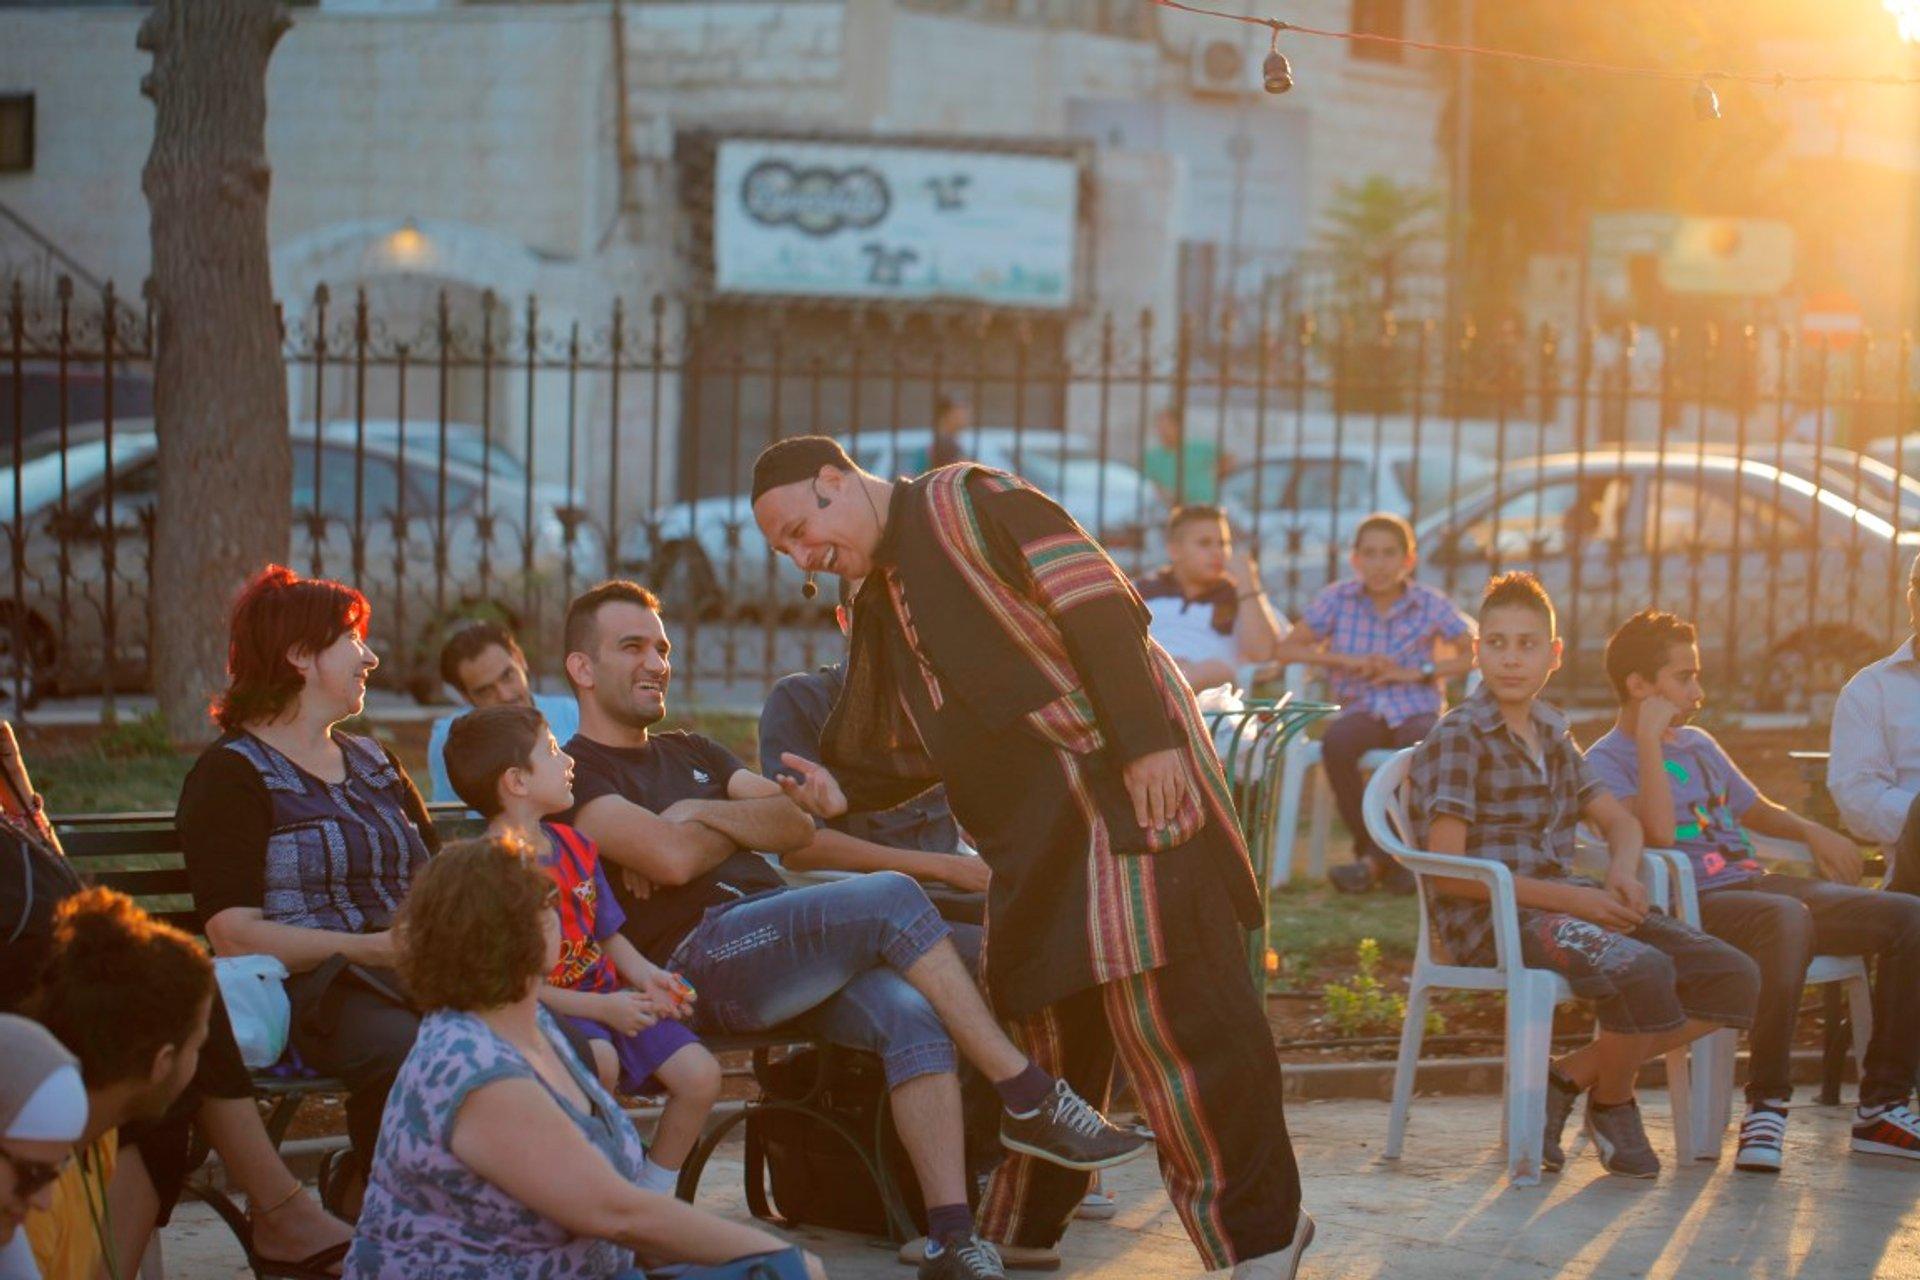 Hakaya Festival in Jordan 2020 - Best Time